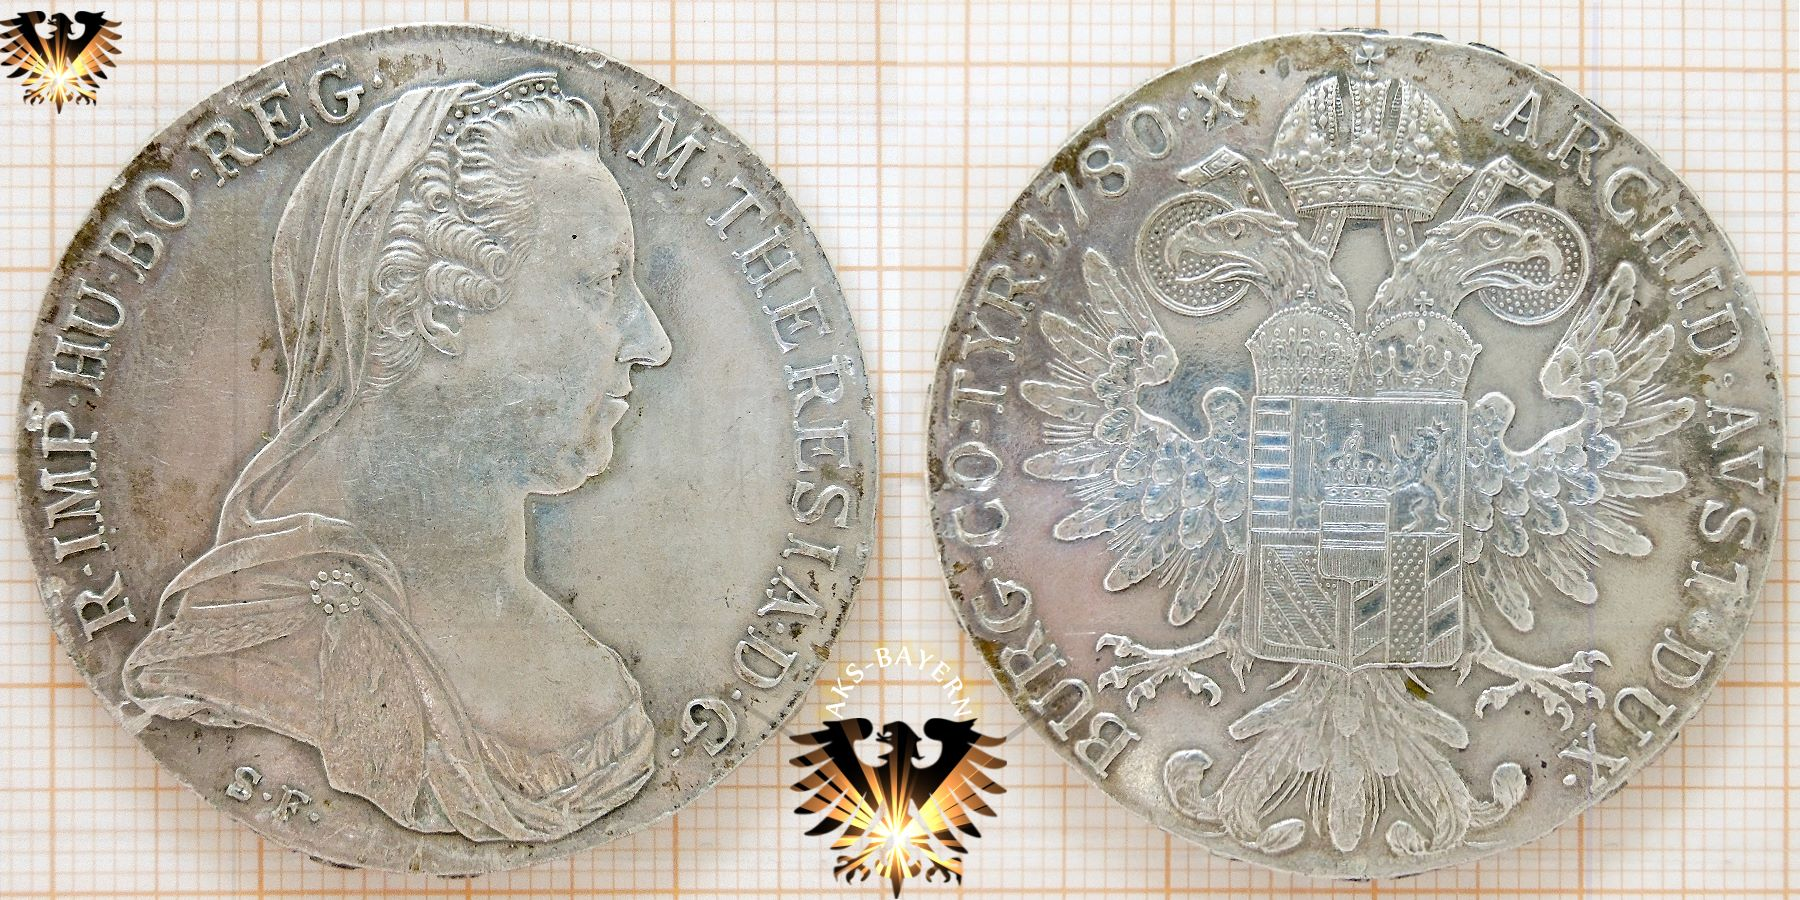 Maria Theresia Taler Silber Wert